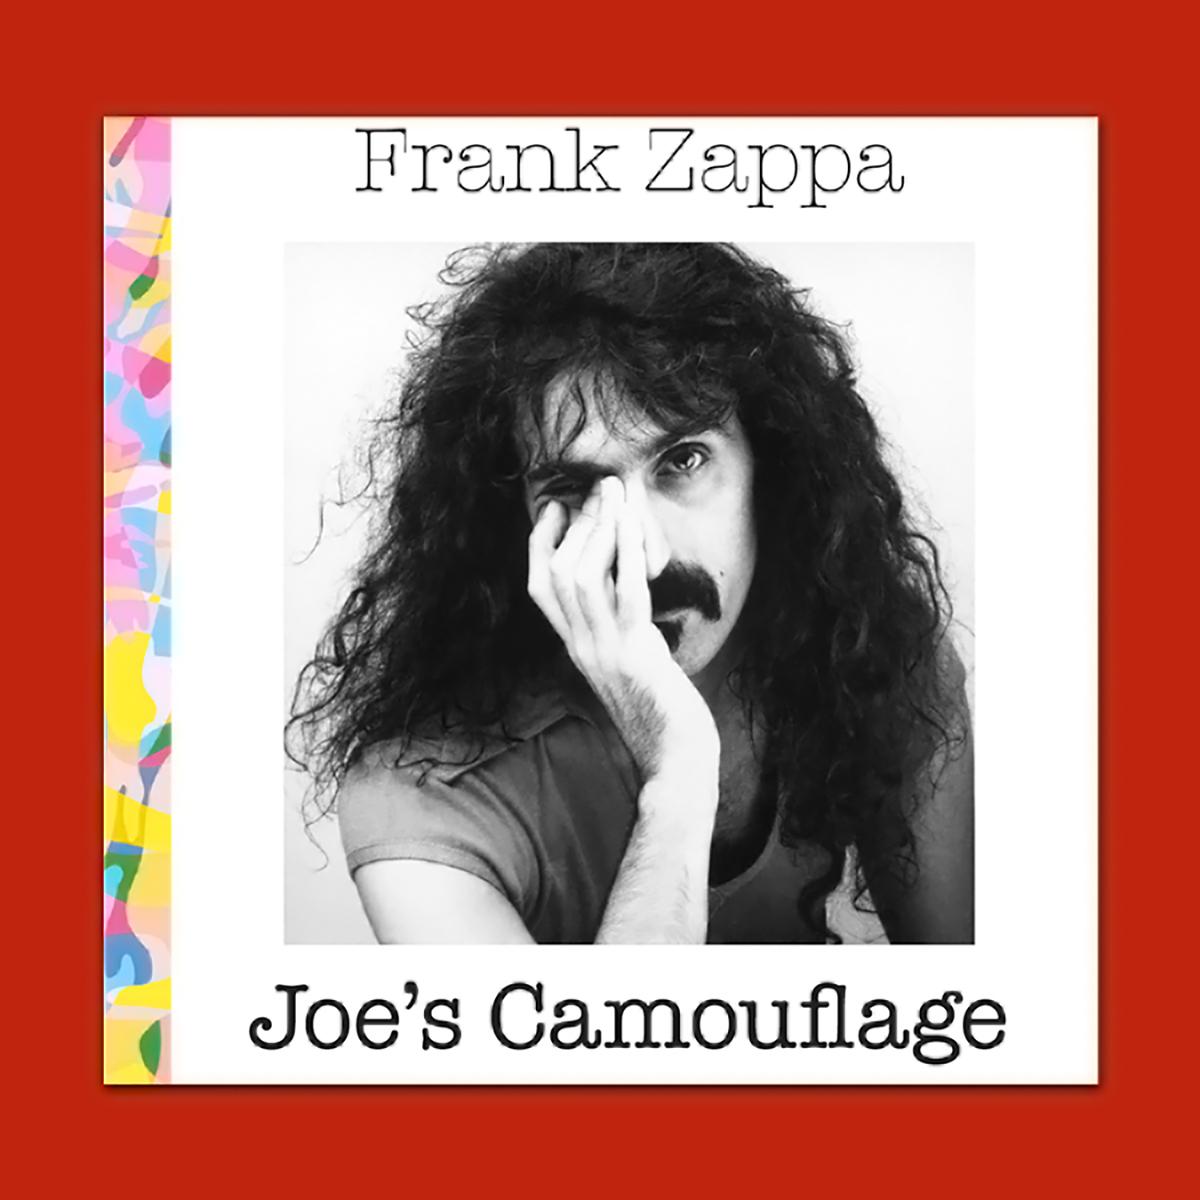 Frank Zappa - Joe's Camouflage CD